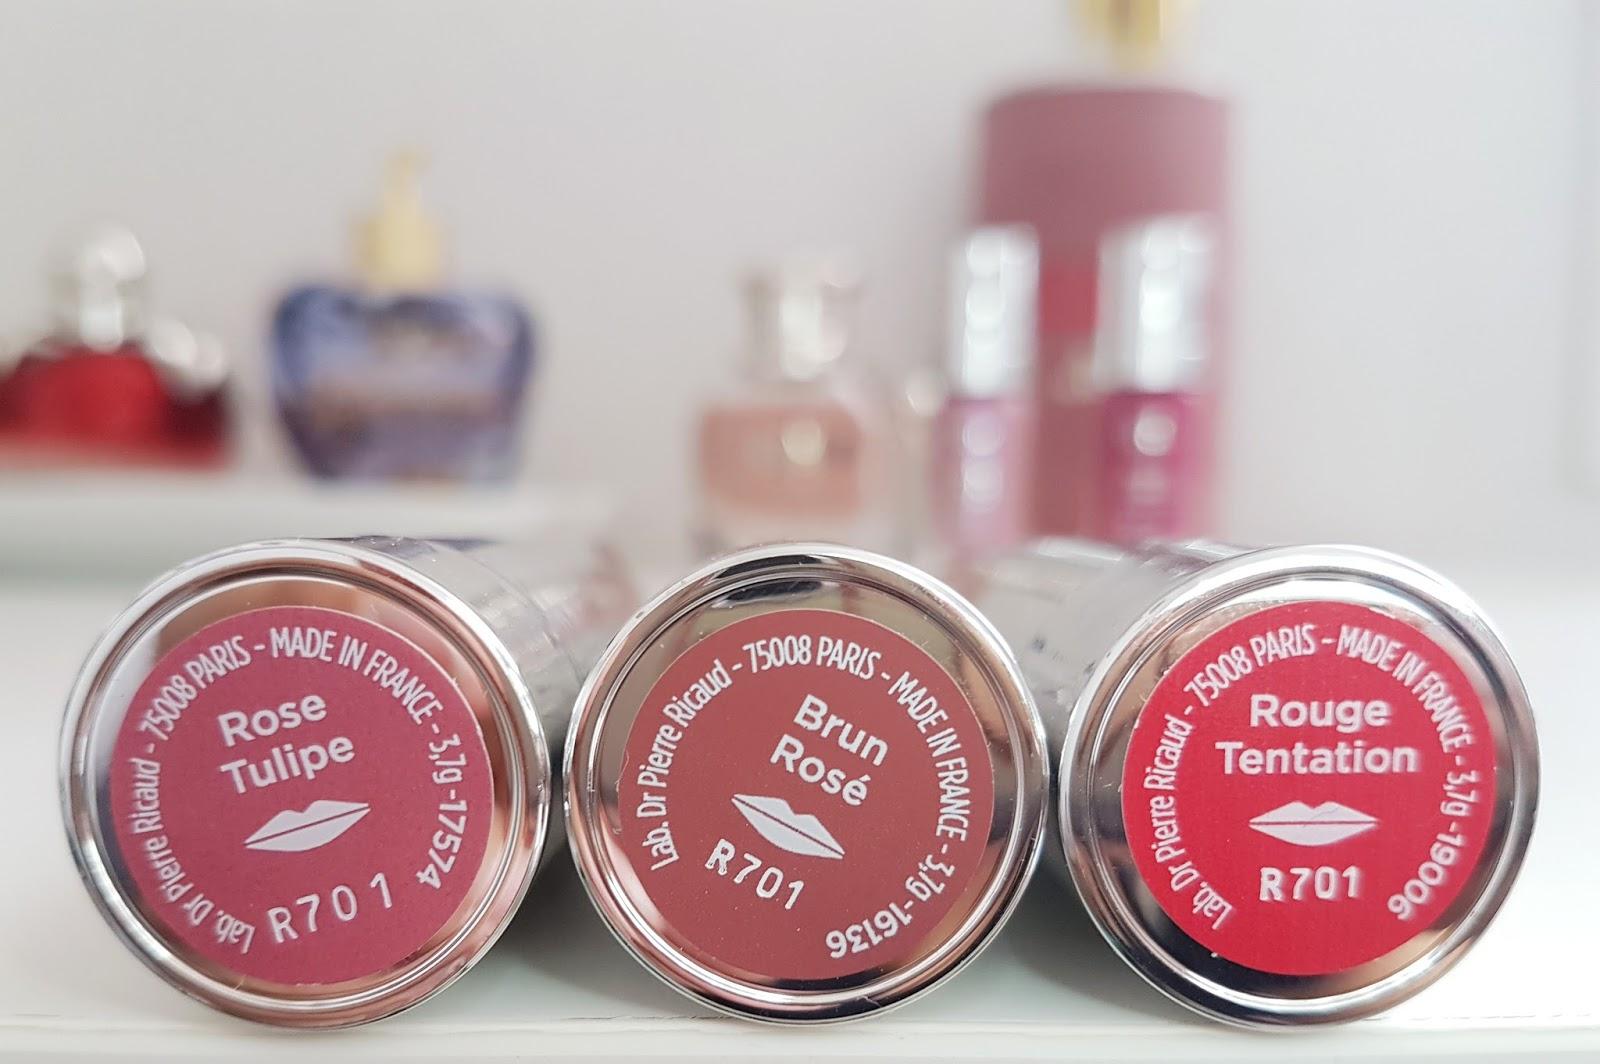 nouveau-rouge-essentiel-dr-pierre-ricaud-avis-swatch-mama-syca-beaute